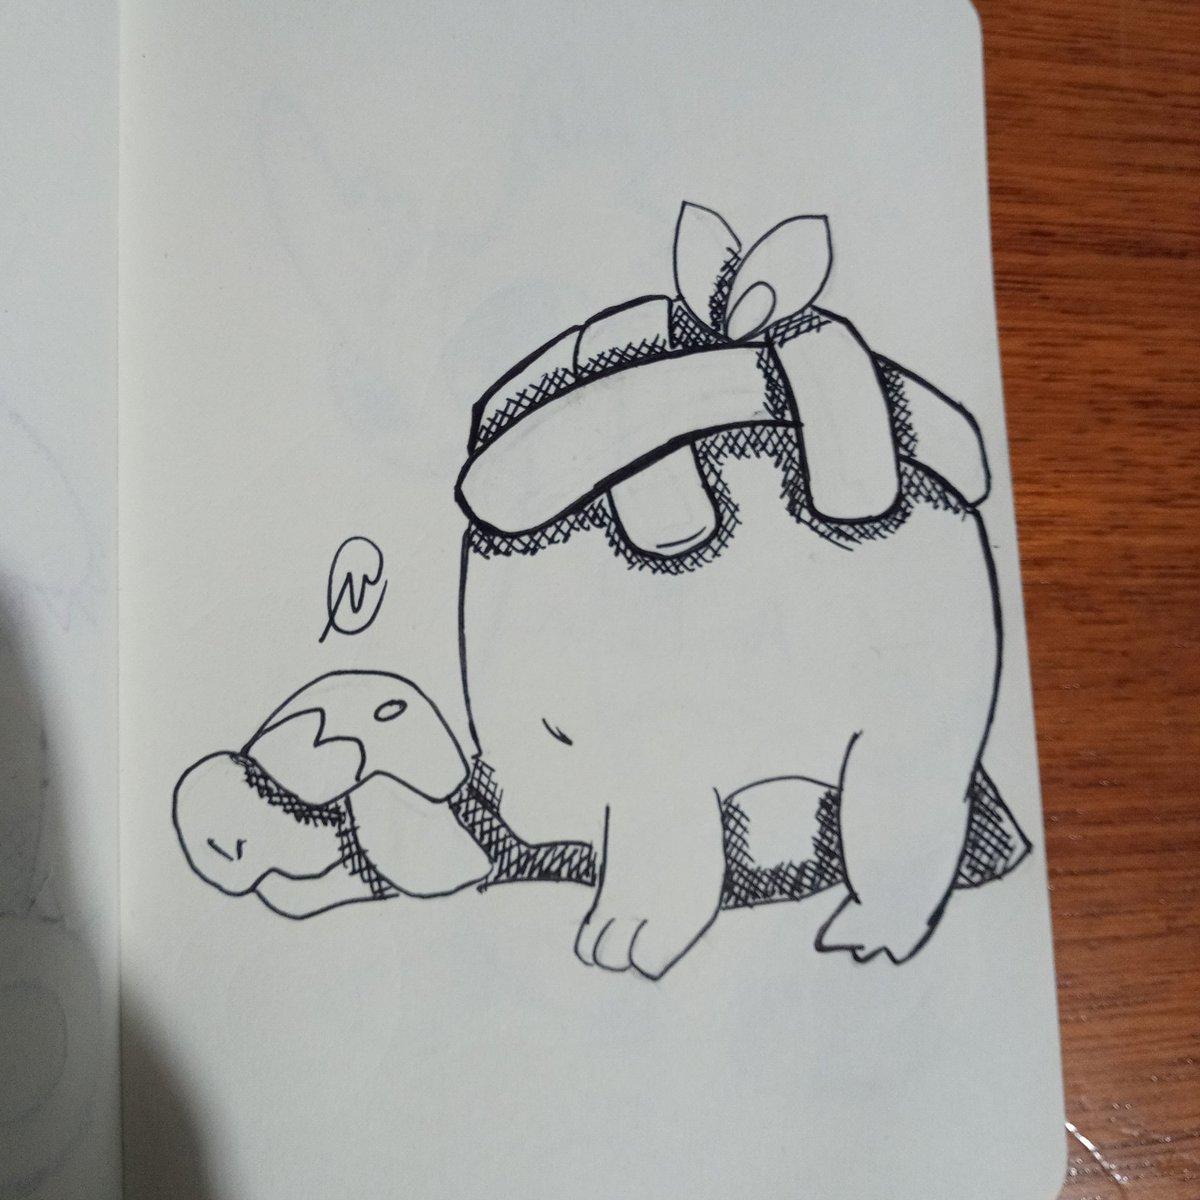 Day 22 Chef #art #arte #artbook #sketchbook #sketch #doodle #dibujo #drawing #traditionalart #markers #rotuladores #boligrafo #pen #tinta #ink #inktober2020 #pokemon #appletun https://t.co/0YMKazlQdA